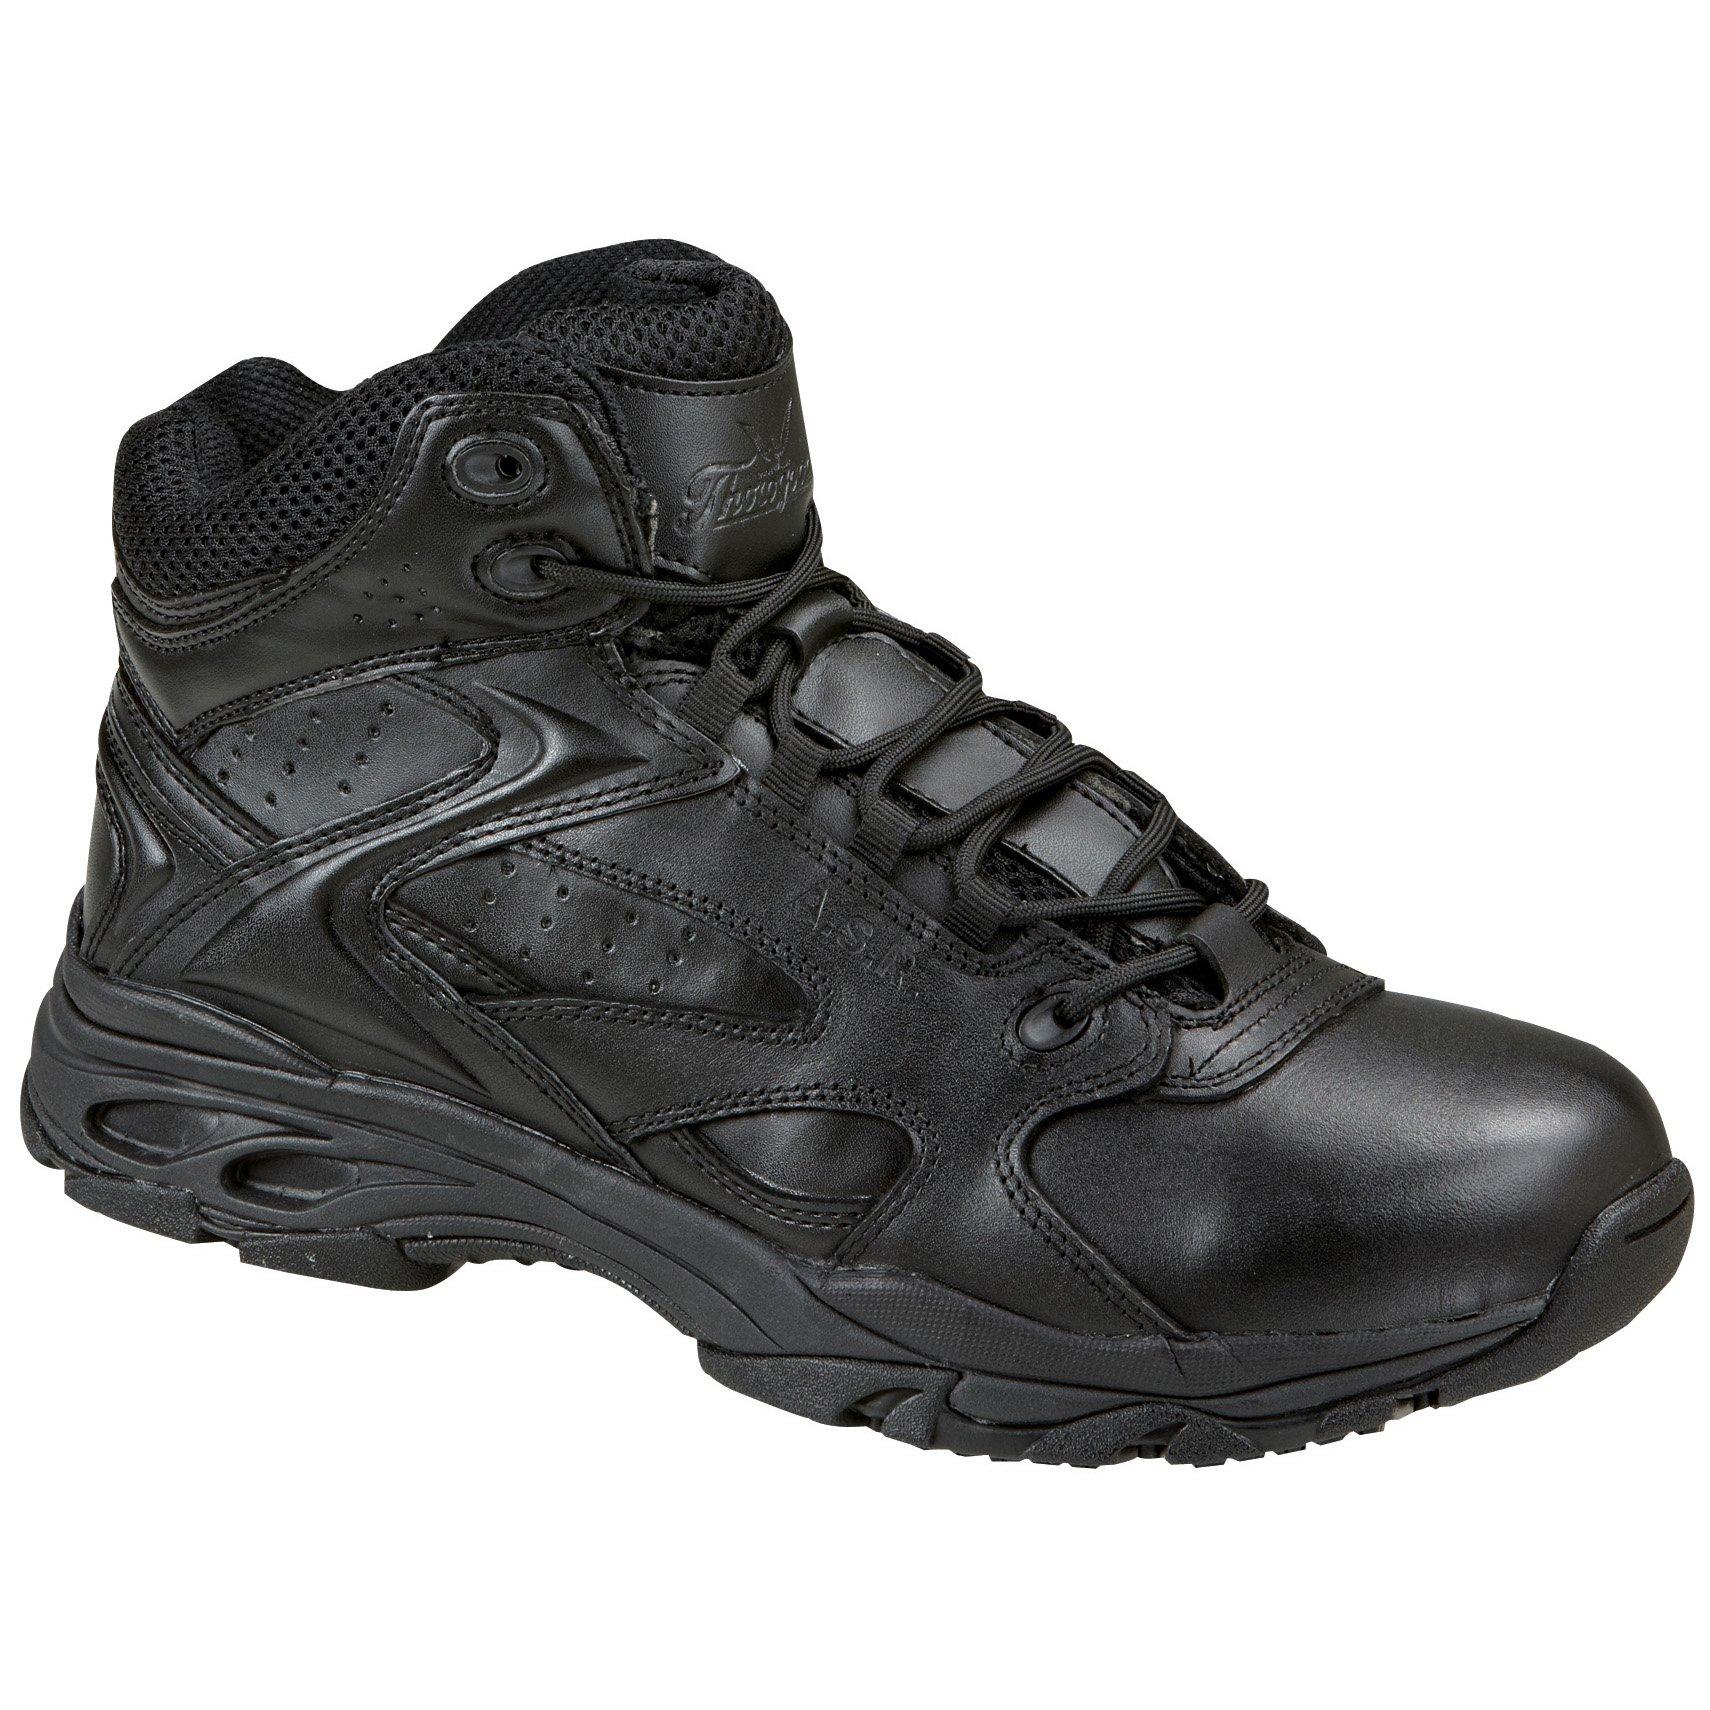 Thorogood Men's Athletic Boots,Black,10 W